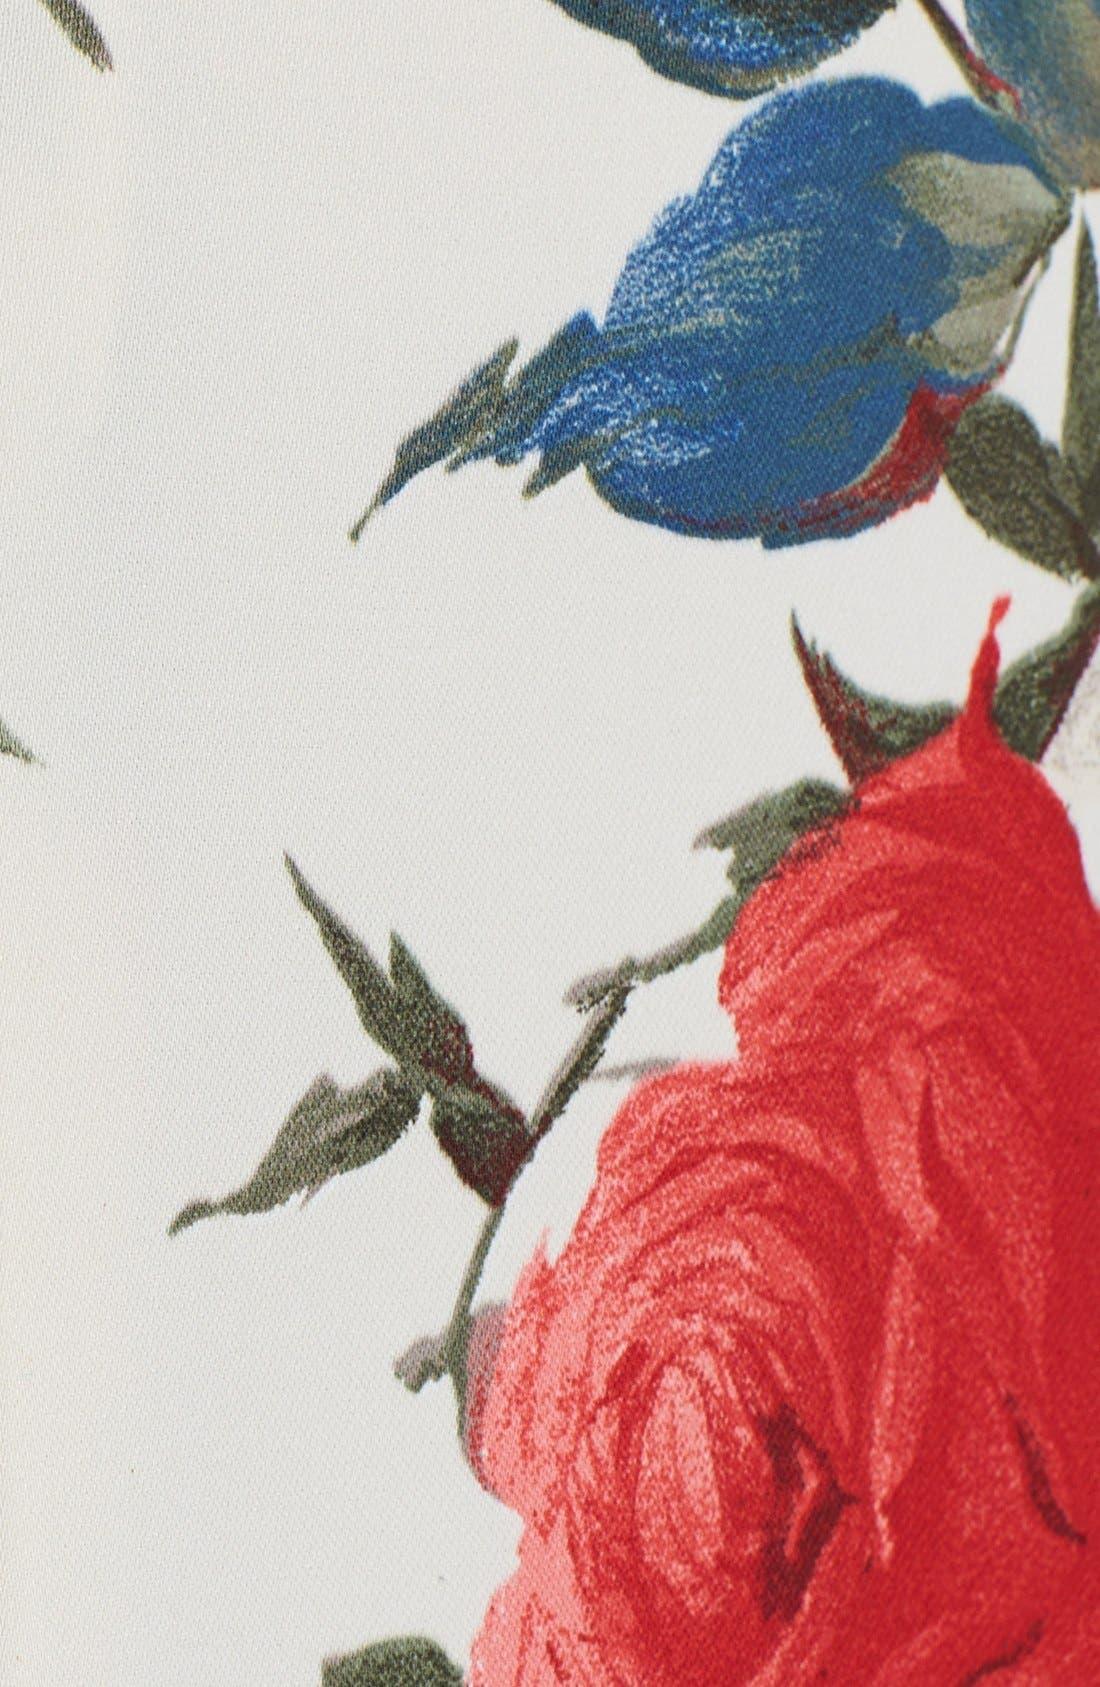 Alternate Image 3  - ABS by Allen Schwartz Vintage Floral Print Fit & Flare Dress (Plus Size)